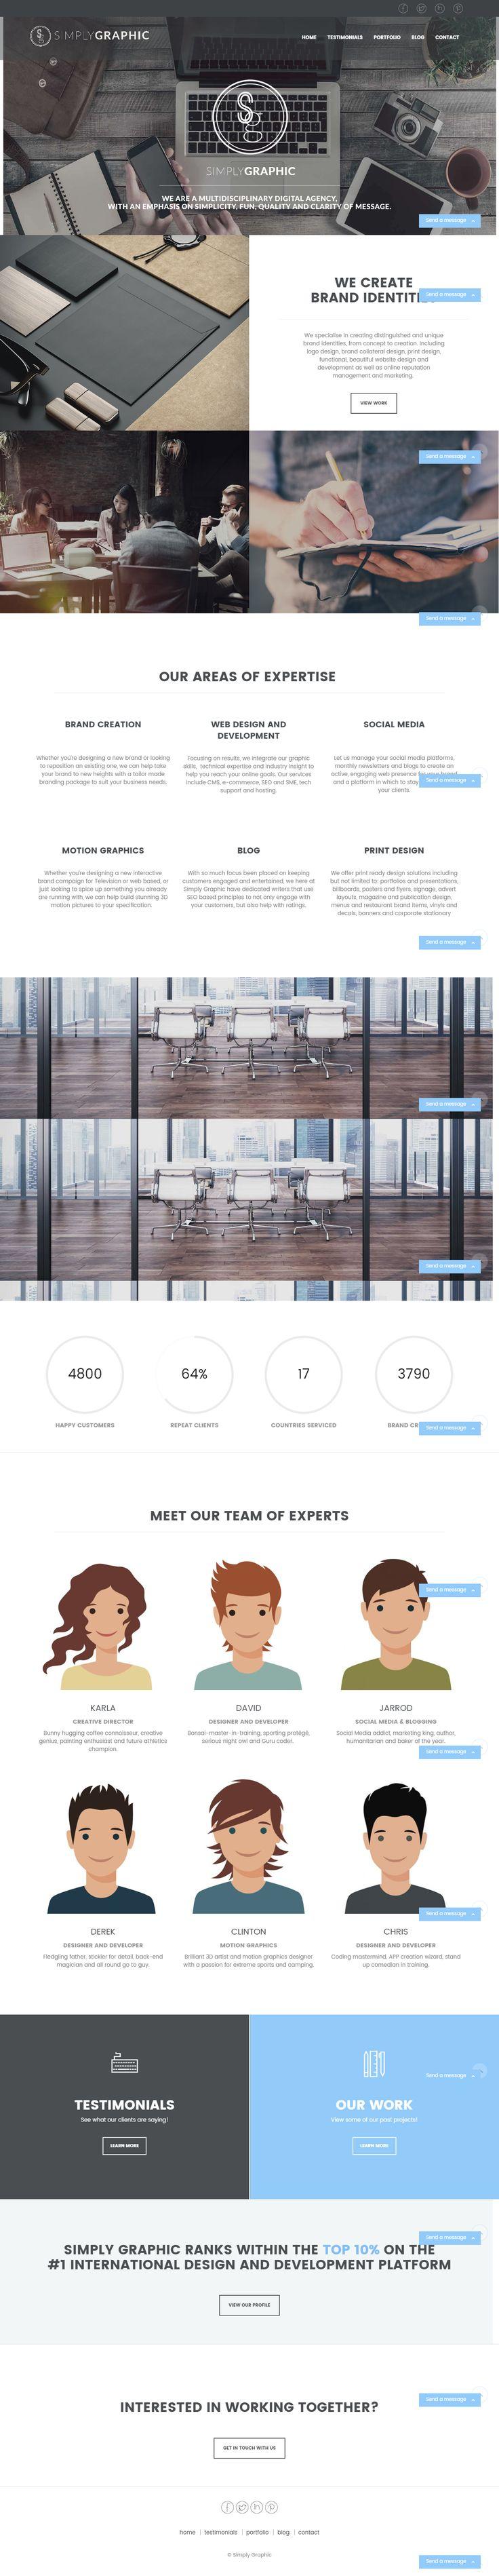 simplygraphic.co.za, powered by Shopkeeper eCommerce WordPress theme https://themeforest.net/item/shopkeeper-ecommerce-wp-theme-for-woocommerce/9553045?utm_source=pinterest.com&utm_medium=social&utm_content=simply-graphic&utm_campaign=showcase #showcase #wordpress #design  #UX